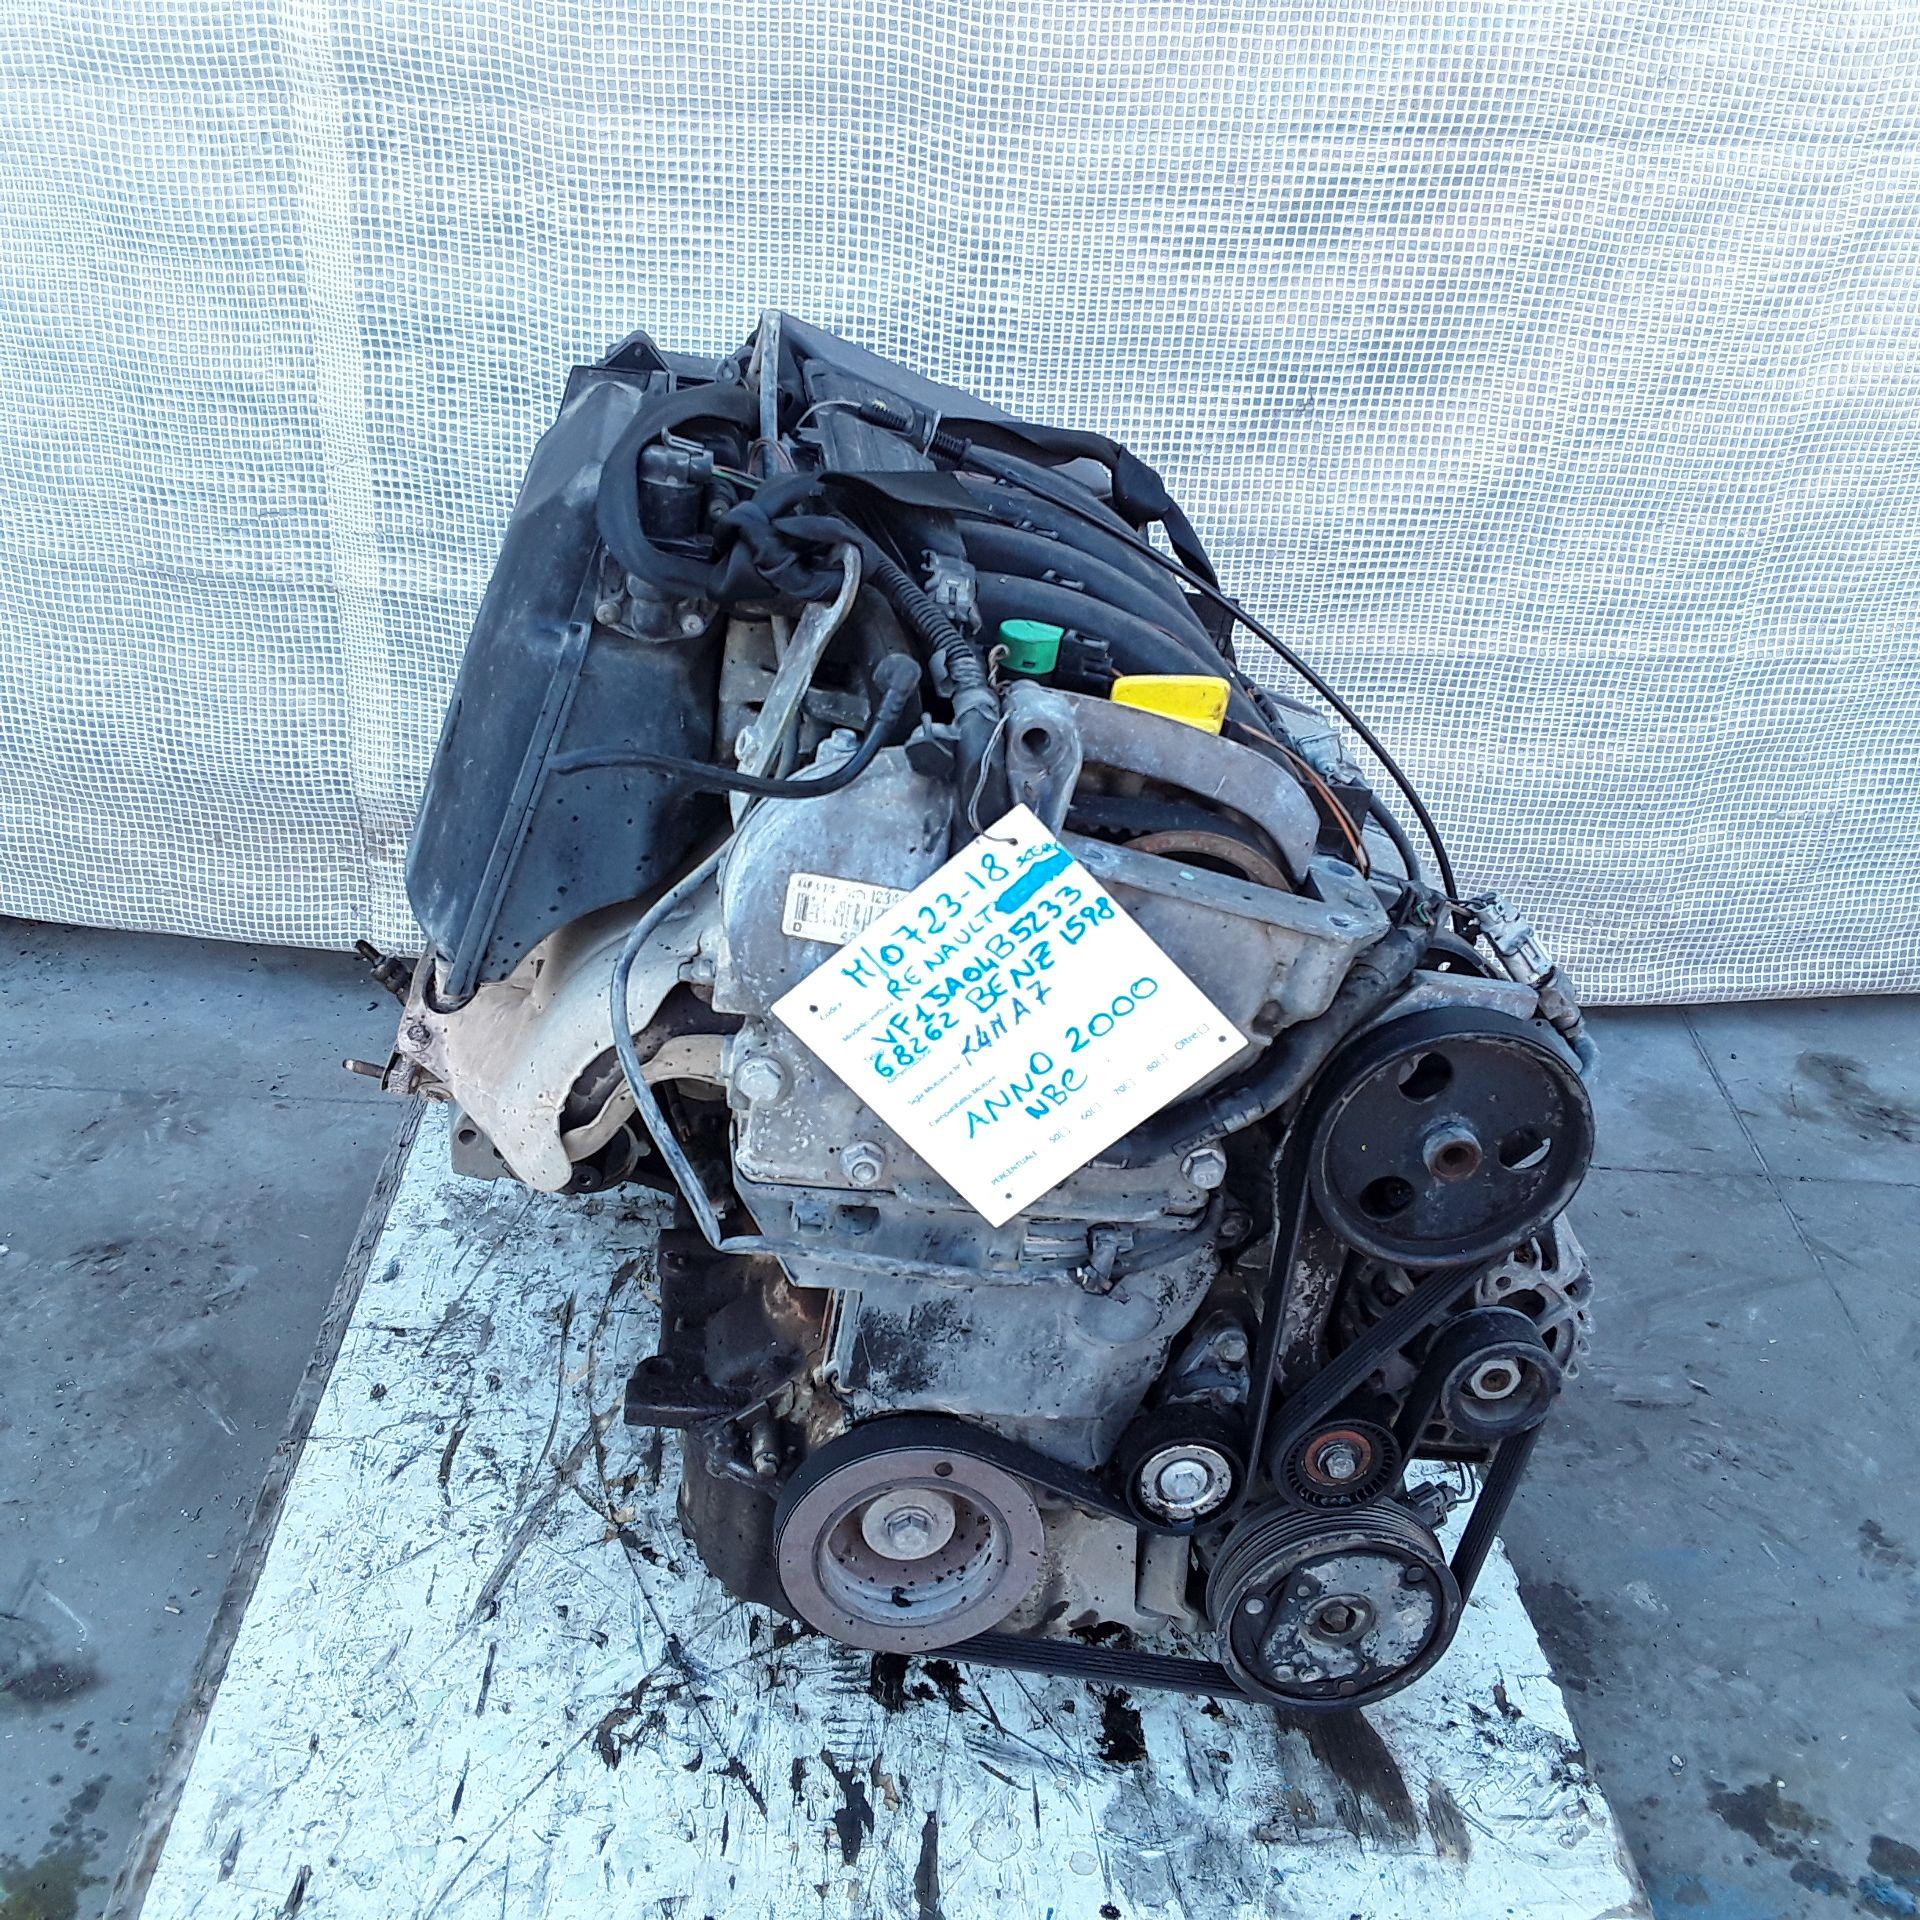 MOTORE COMPLETO RENAULT Scenic Serie (99>03) 1598 Benzina K4ma7 150000 Km  (2000) RICAMBI USATI